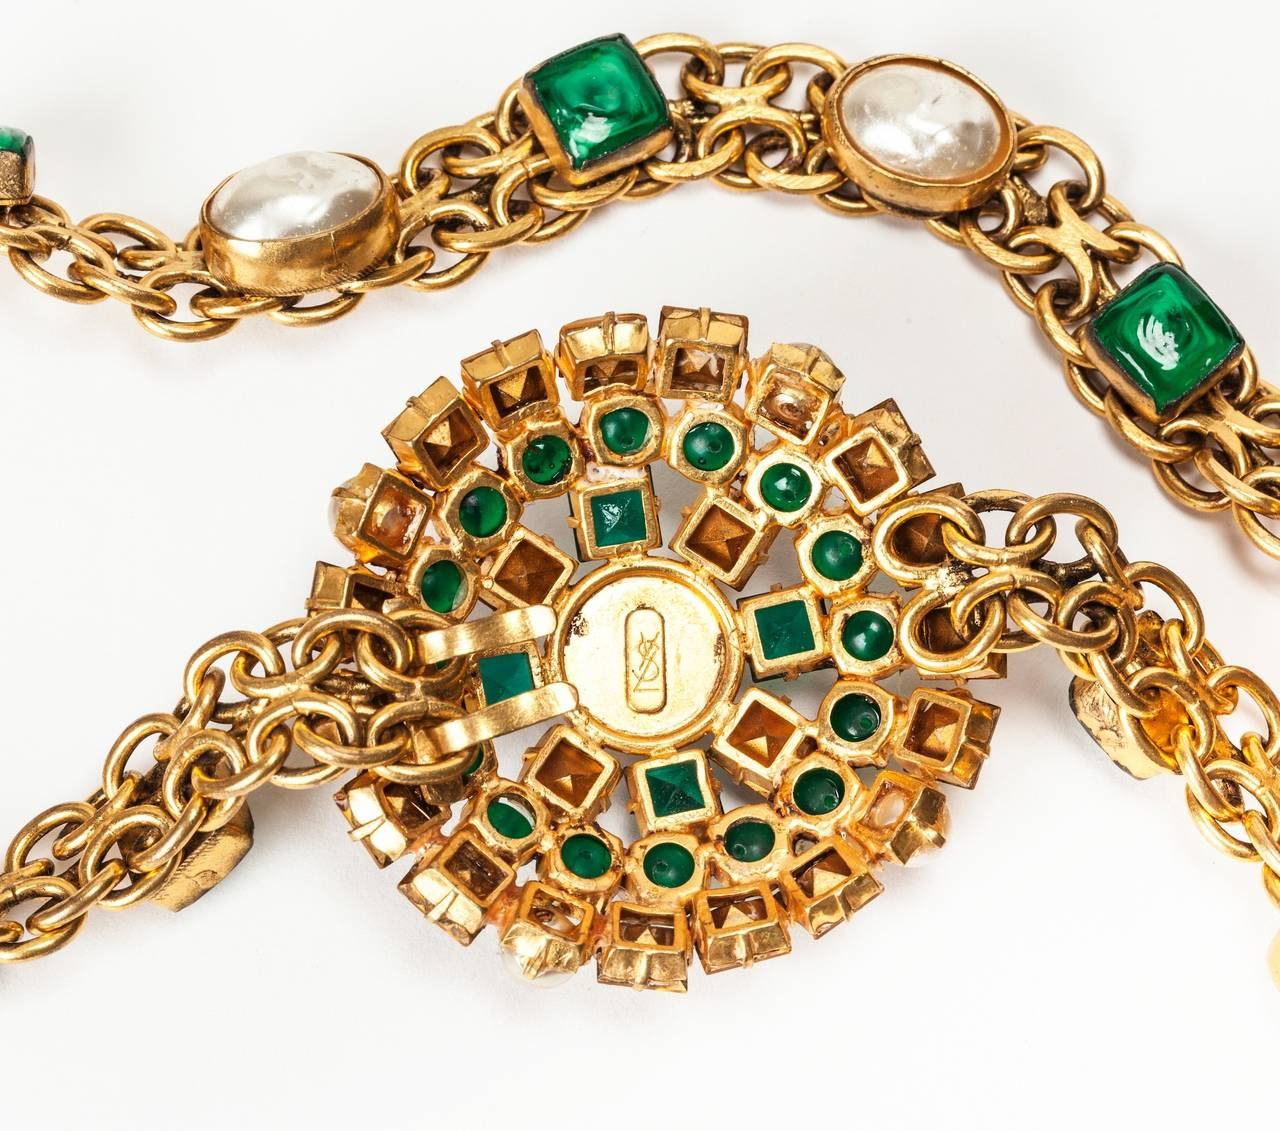 Yves Saint Laurent Haute Couture Jeweled Belt Goossens